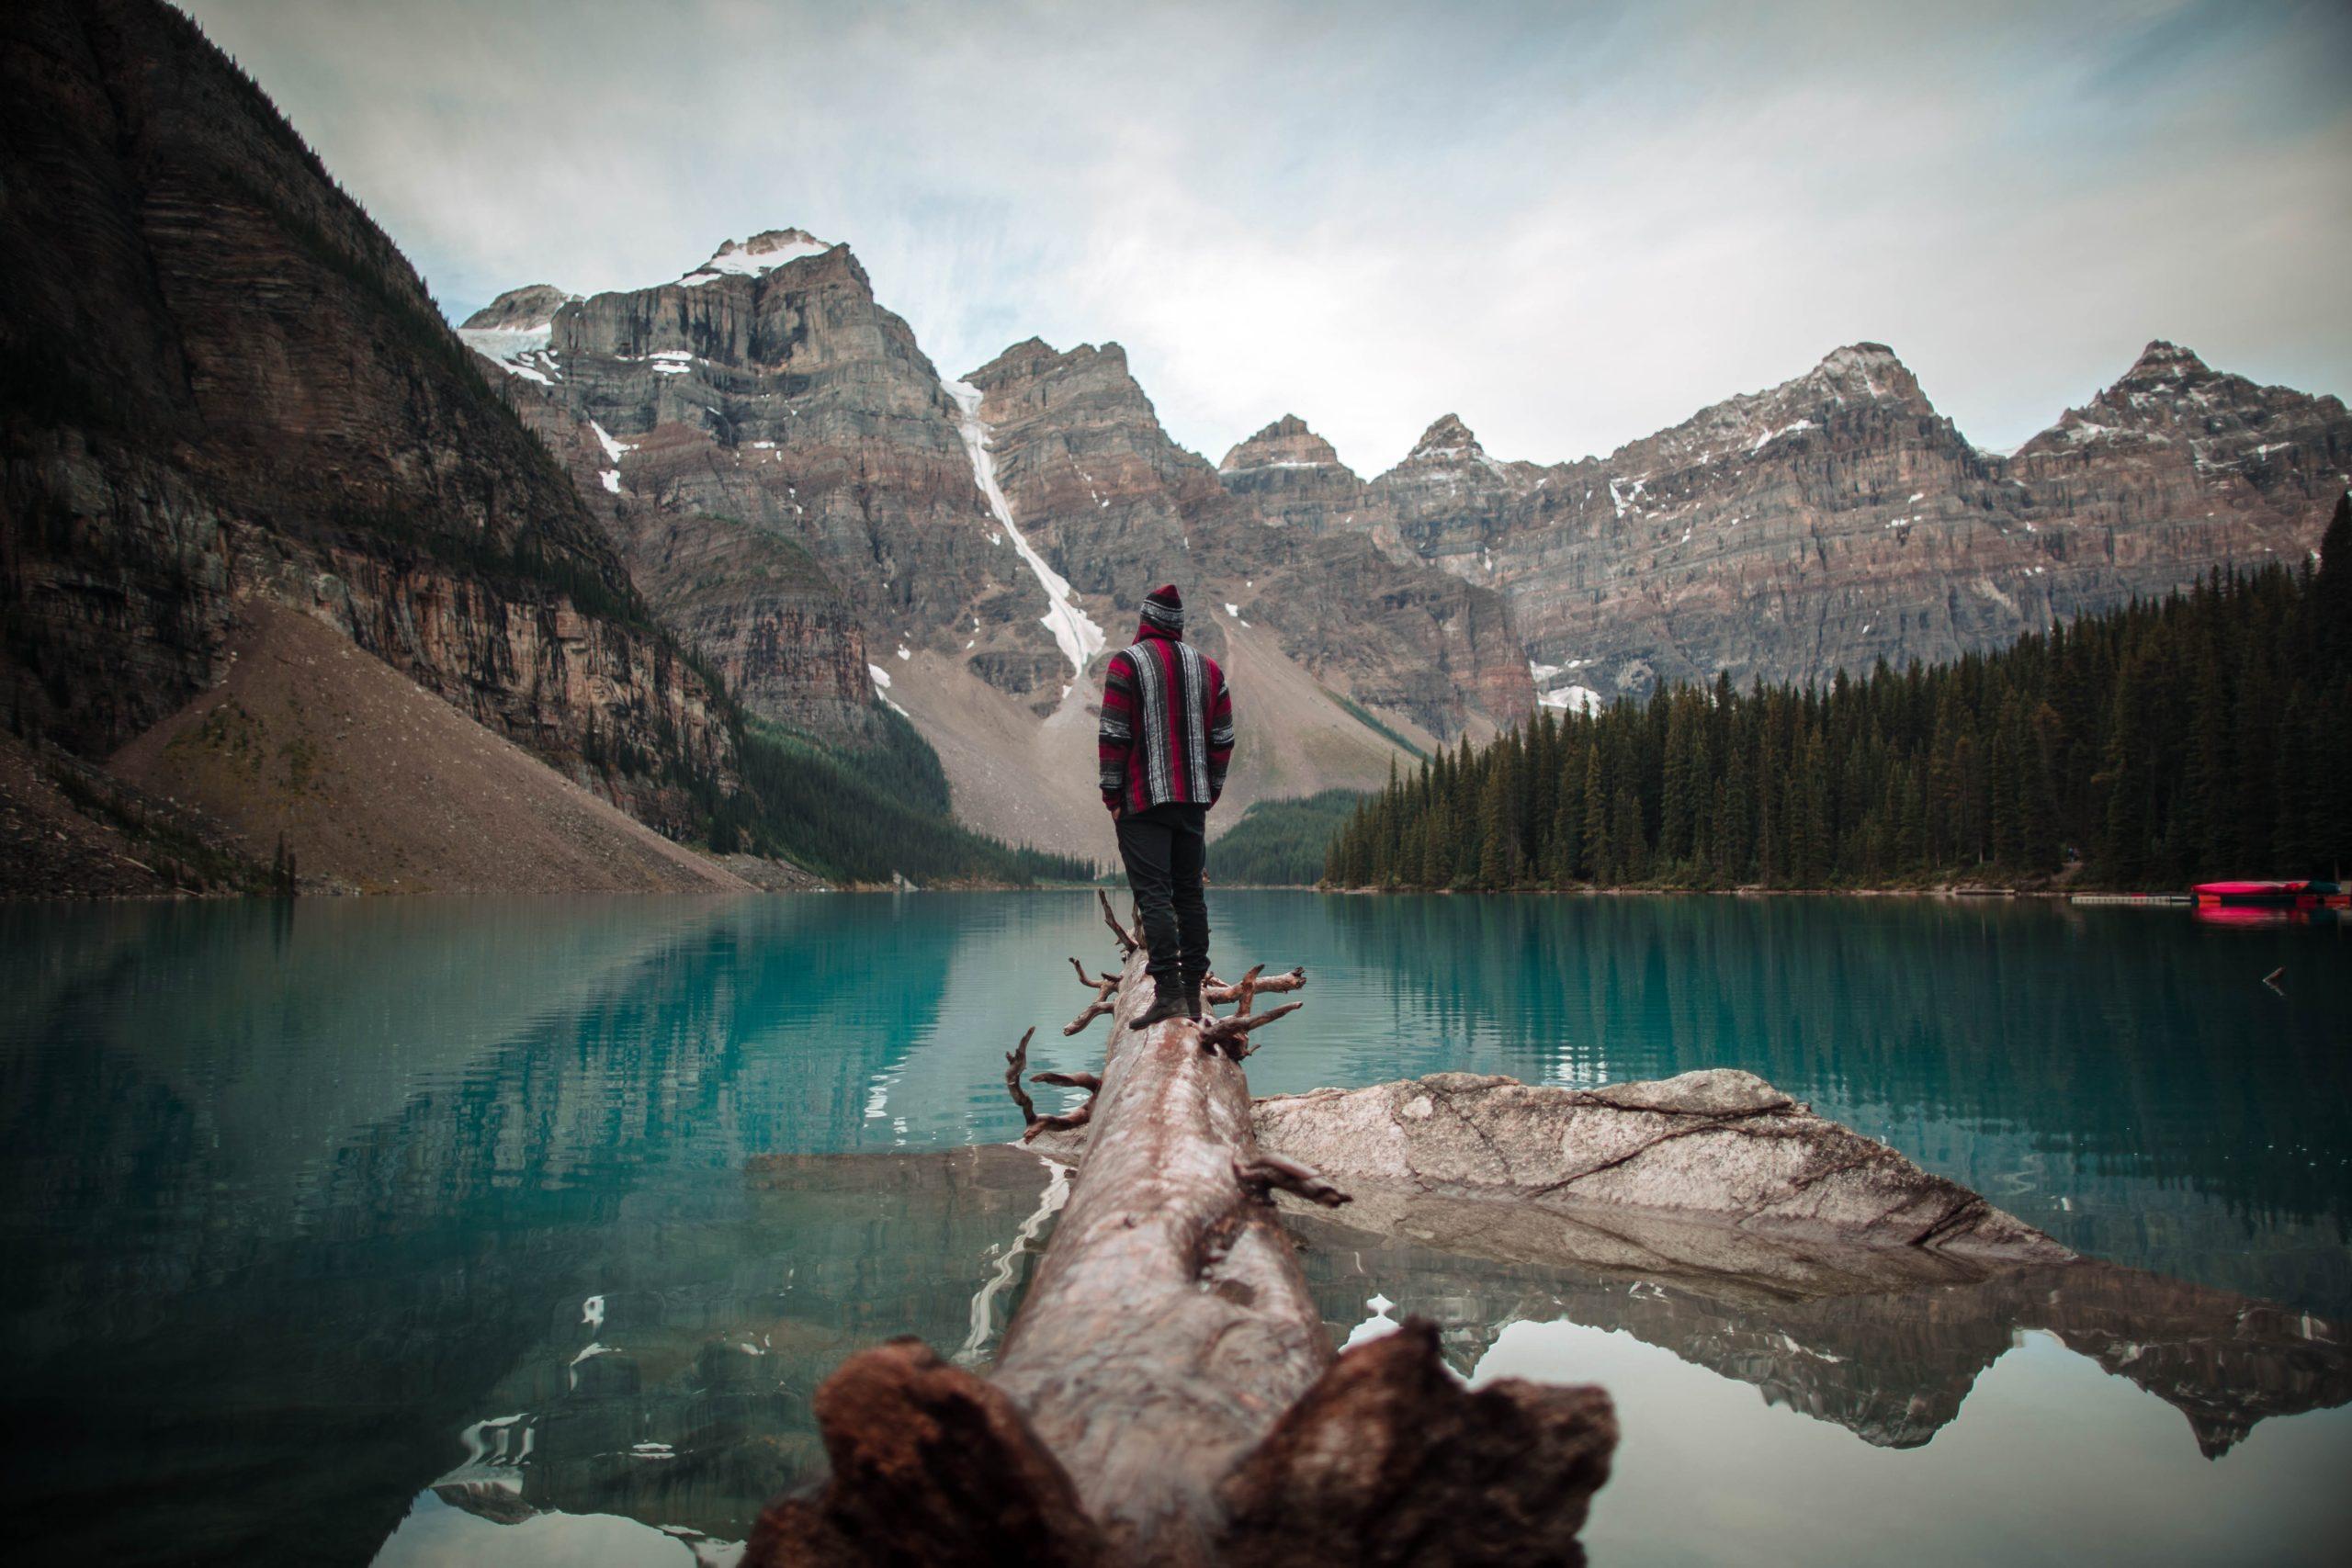 conseils_de_voyage_moraine_lake_canada_alberta-rocheuses_banff